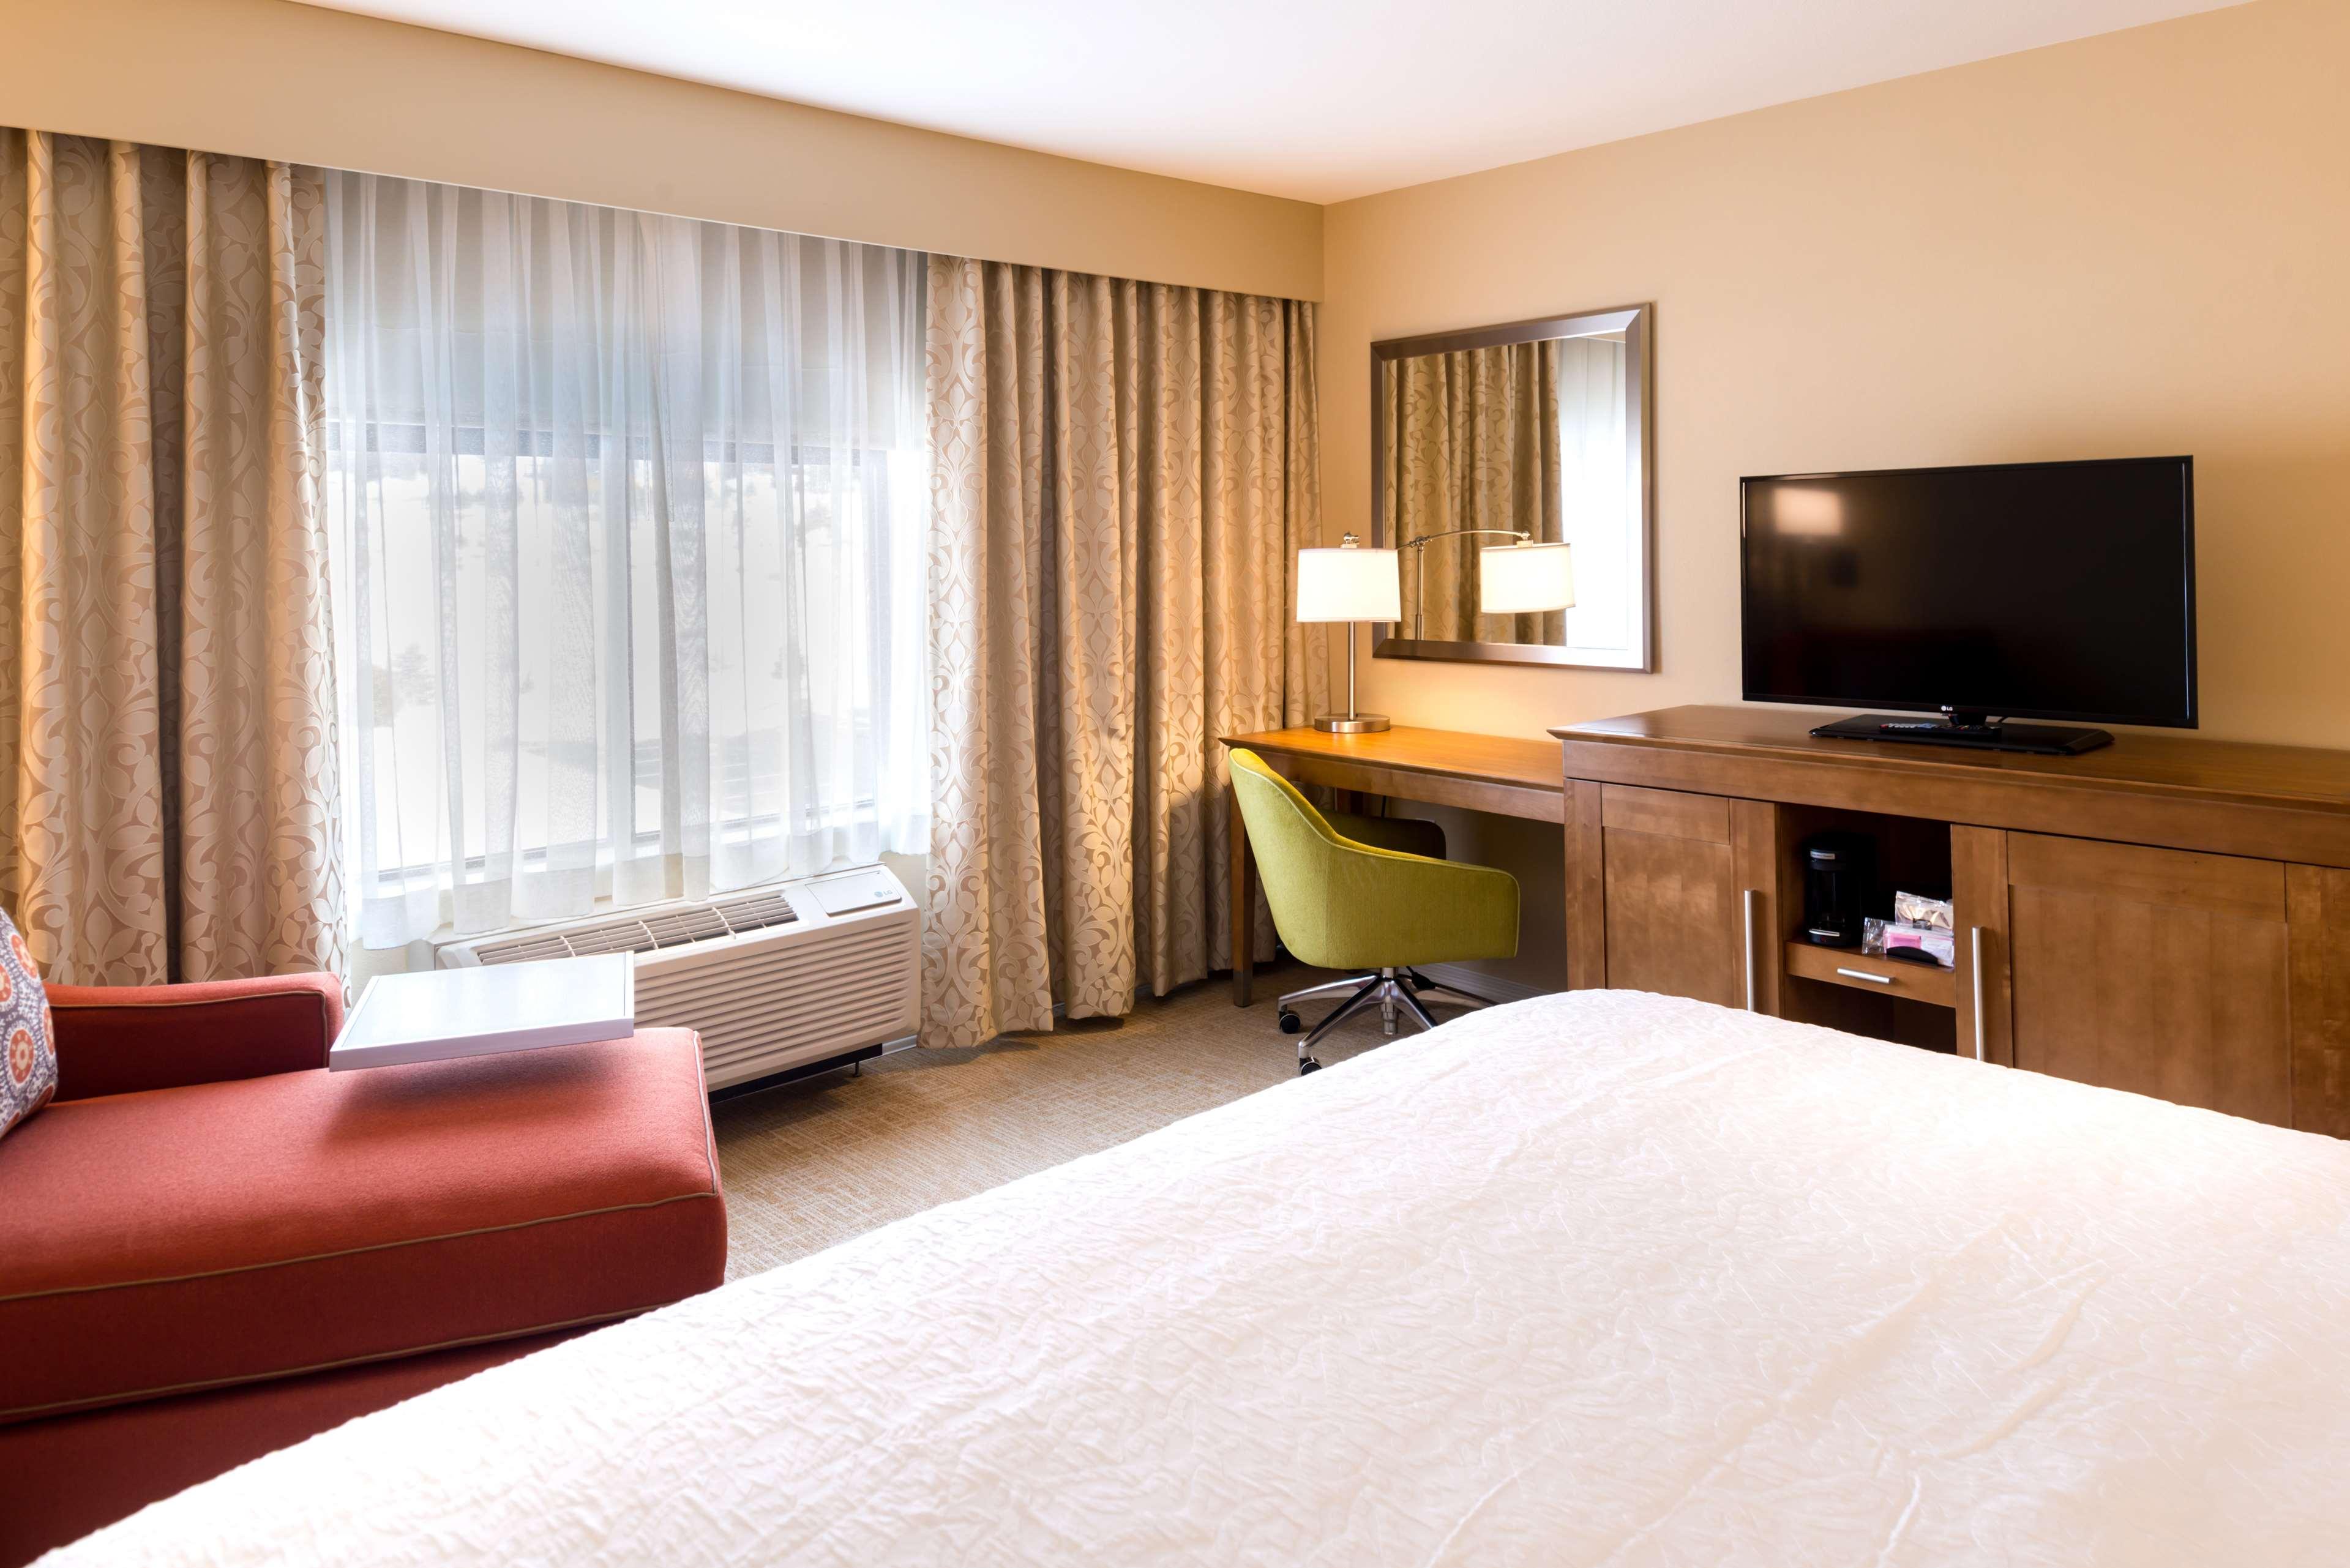 Hampton Inn & Suites Silverthorne image 20